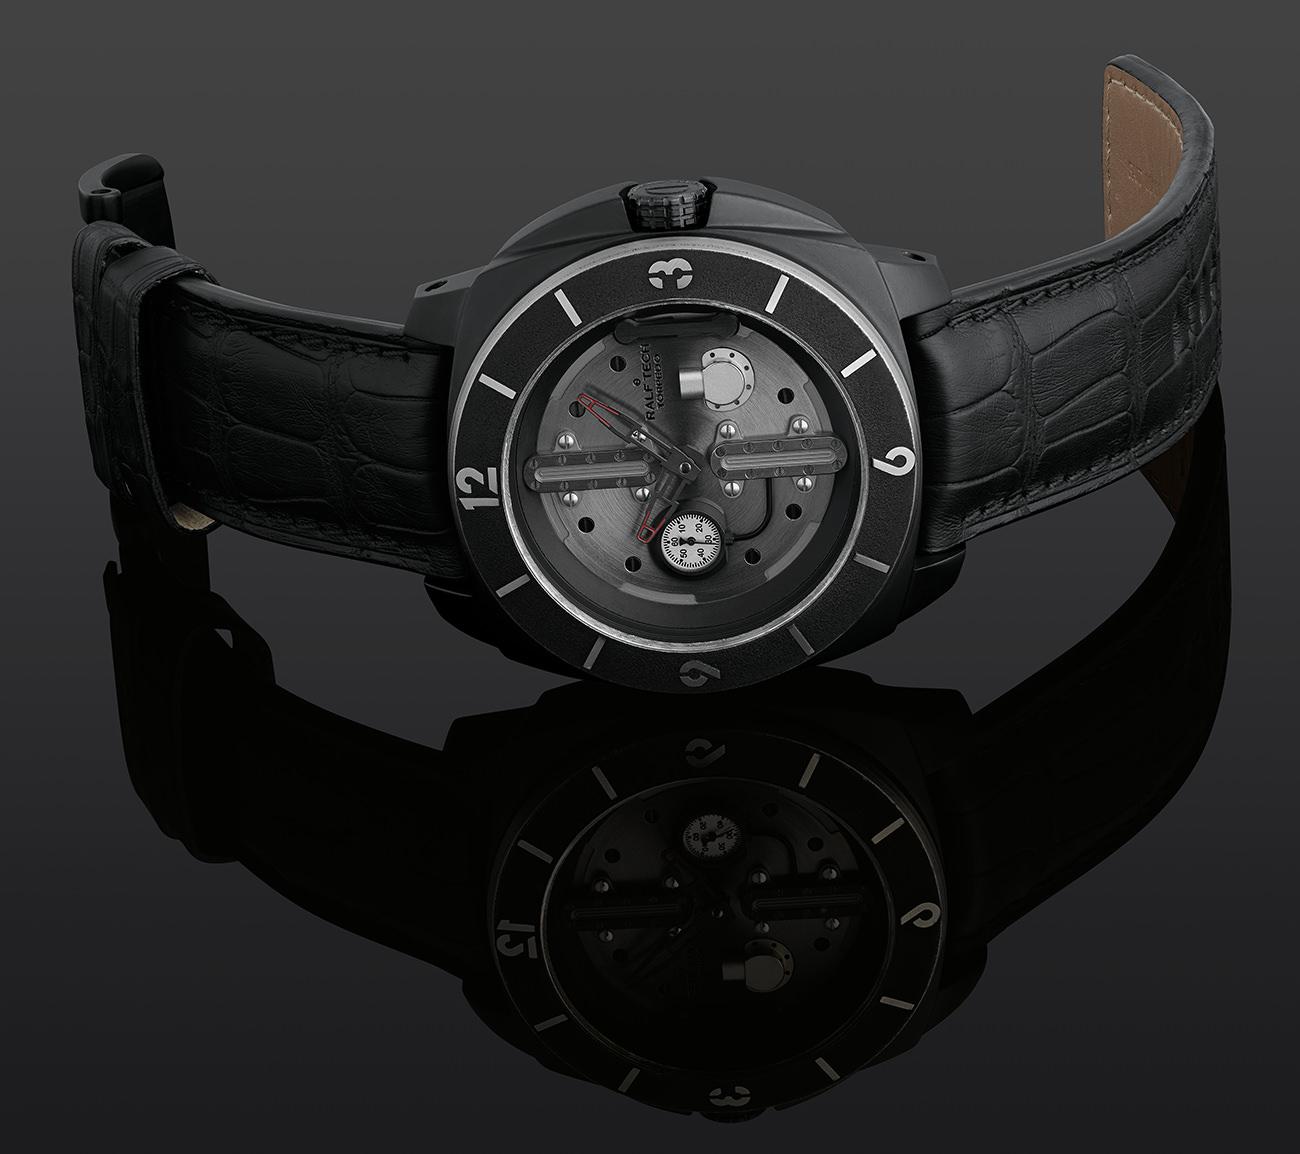 Ralf-Tech-Torpedo-3